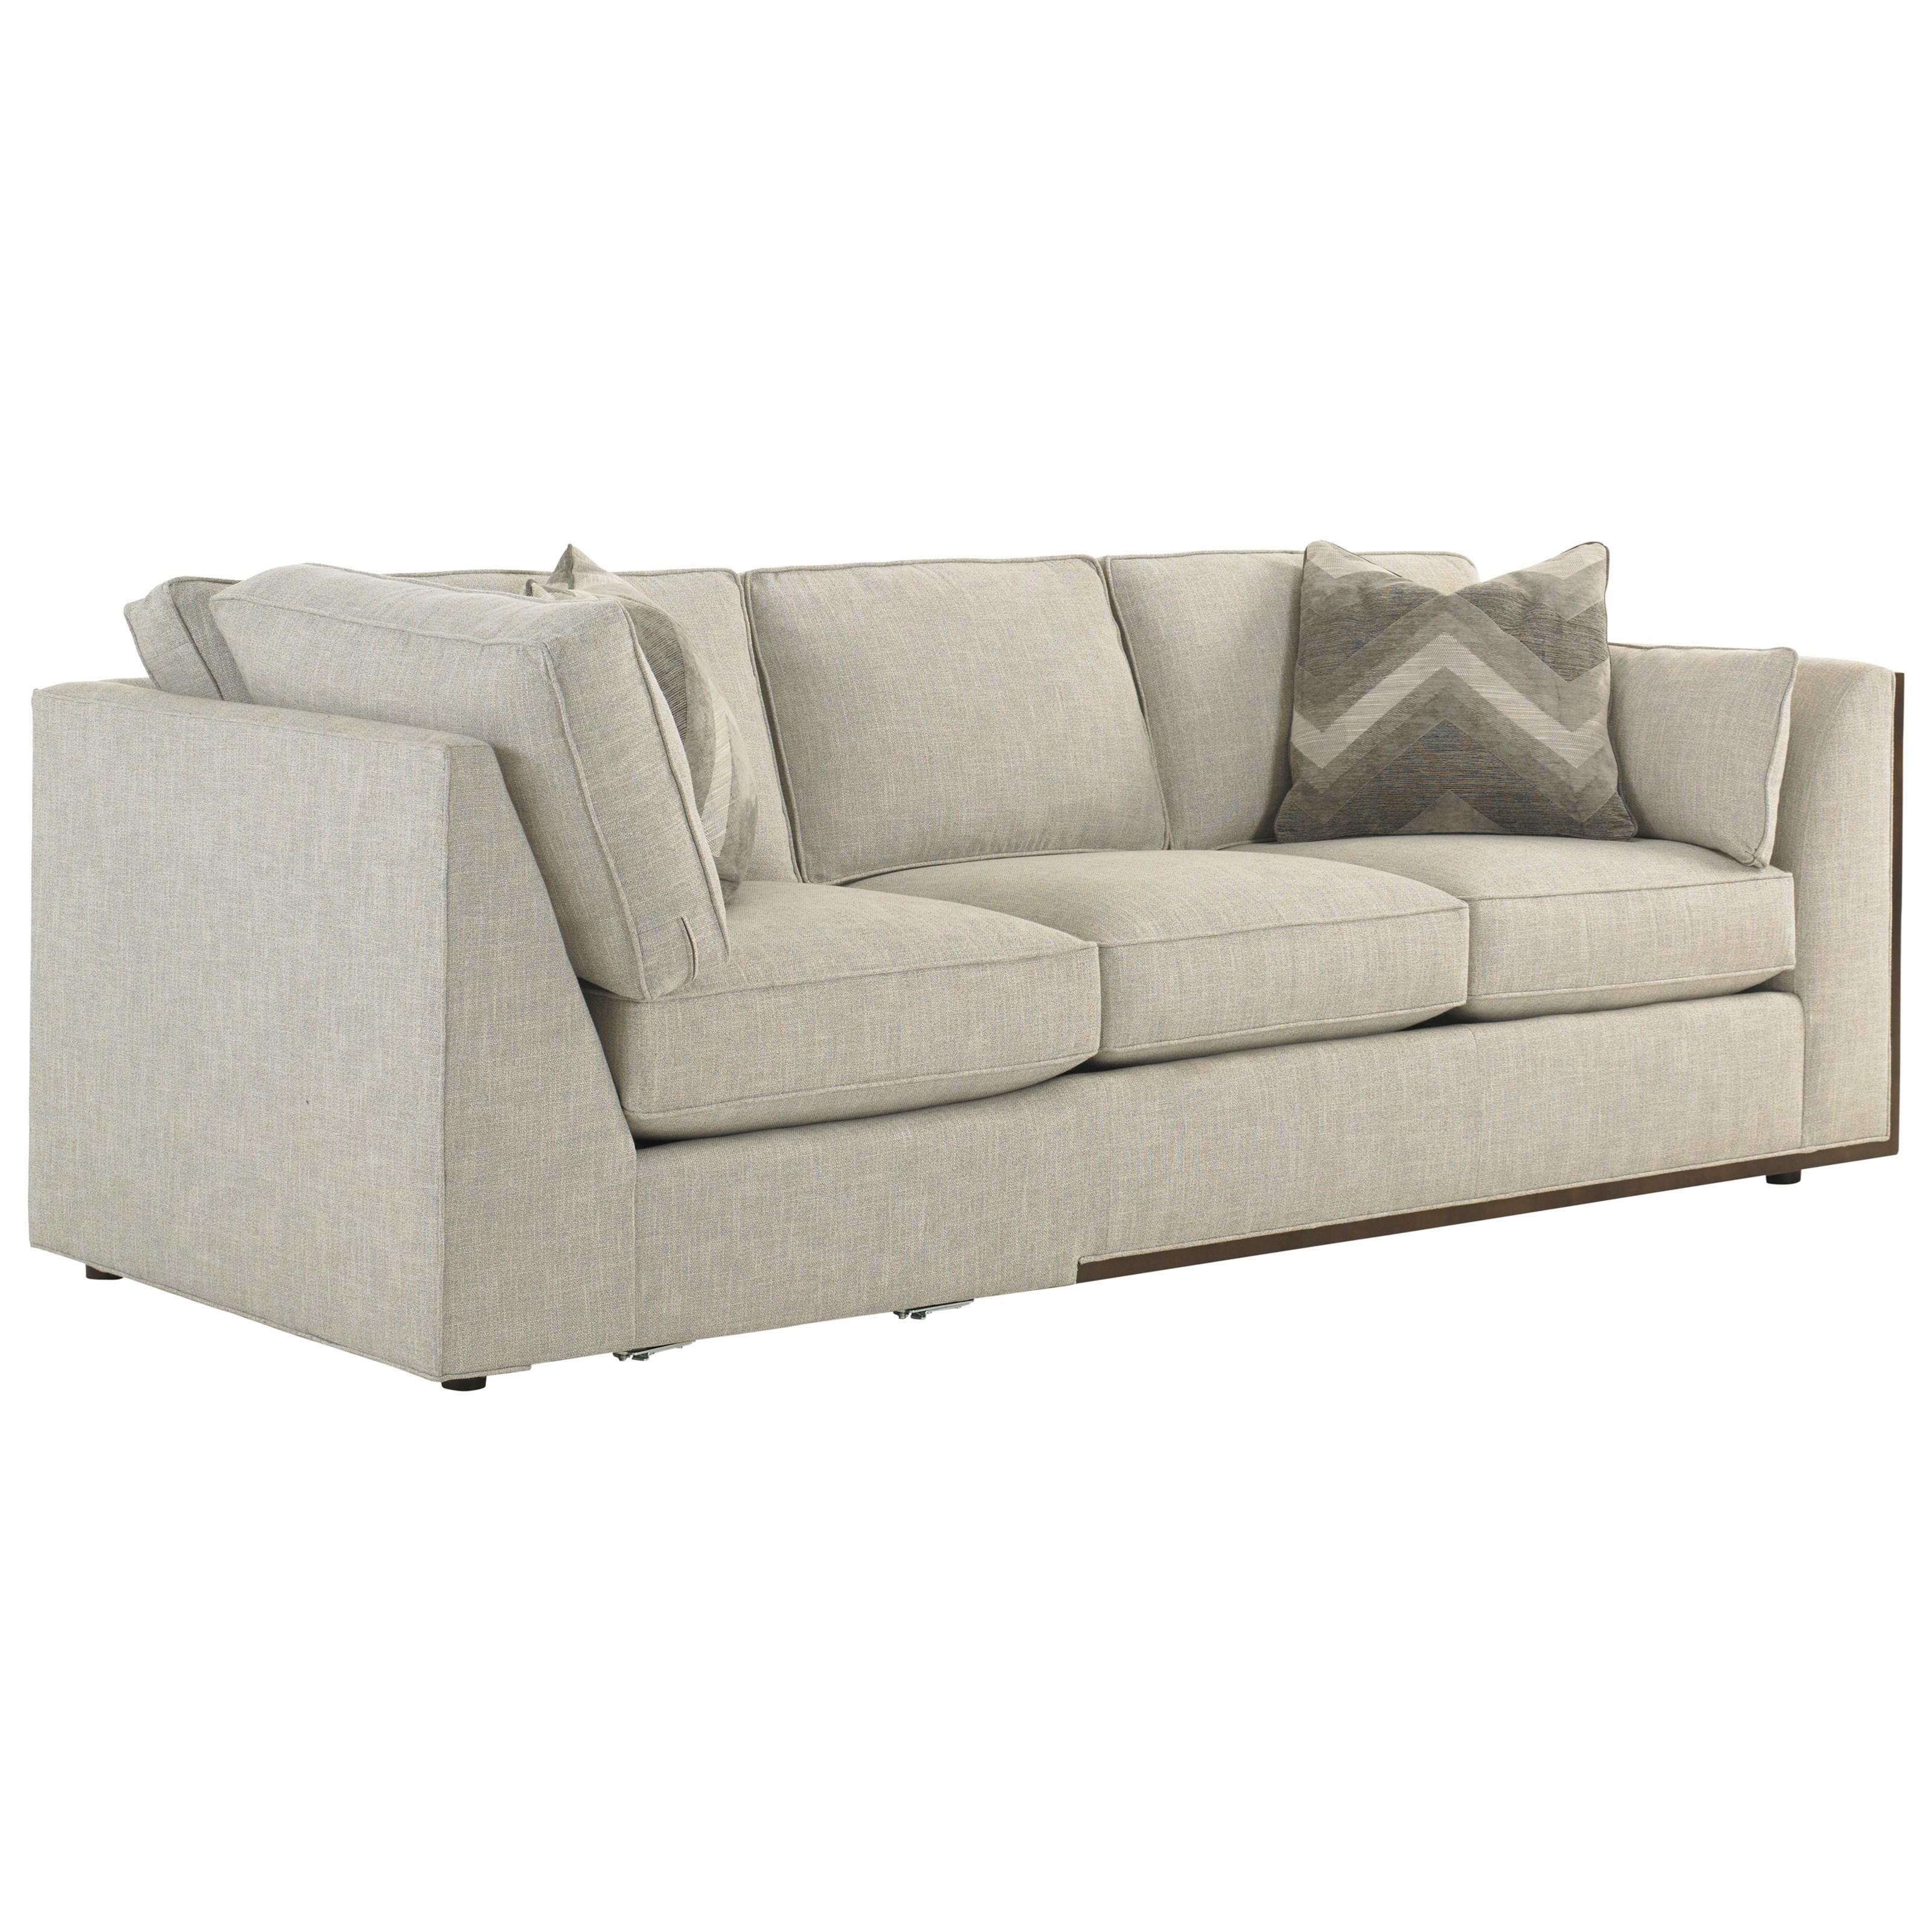 Lexington Macarthur Park Westcliffe Sectional Sofa Does